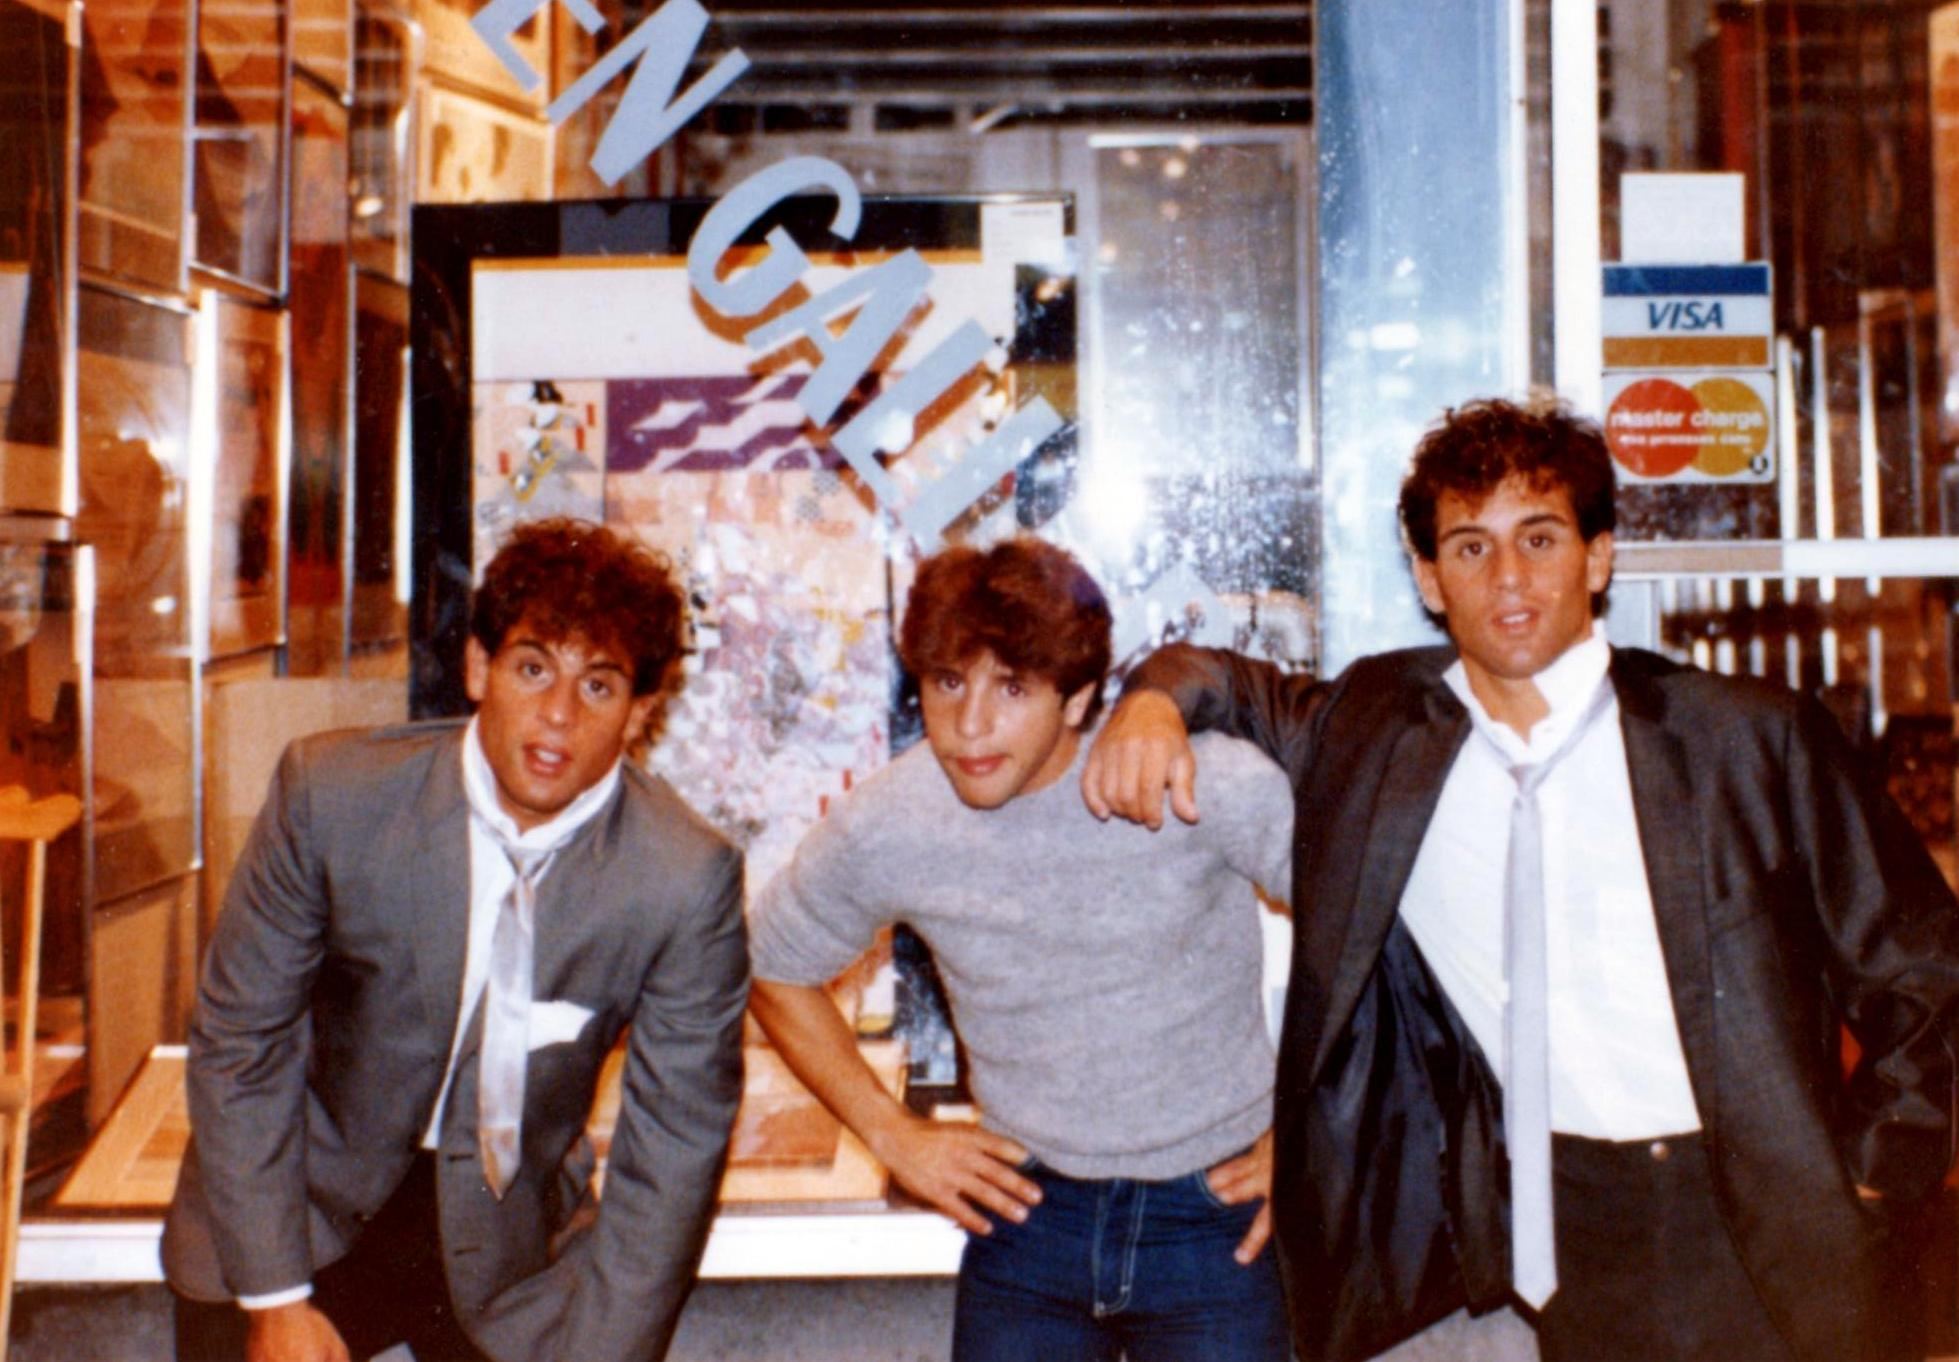 Alex, Gerard, and John Rinaldi outside of The Comic Strip in 1981